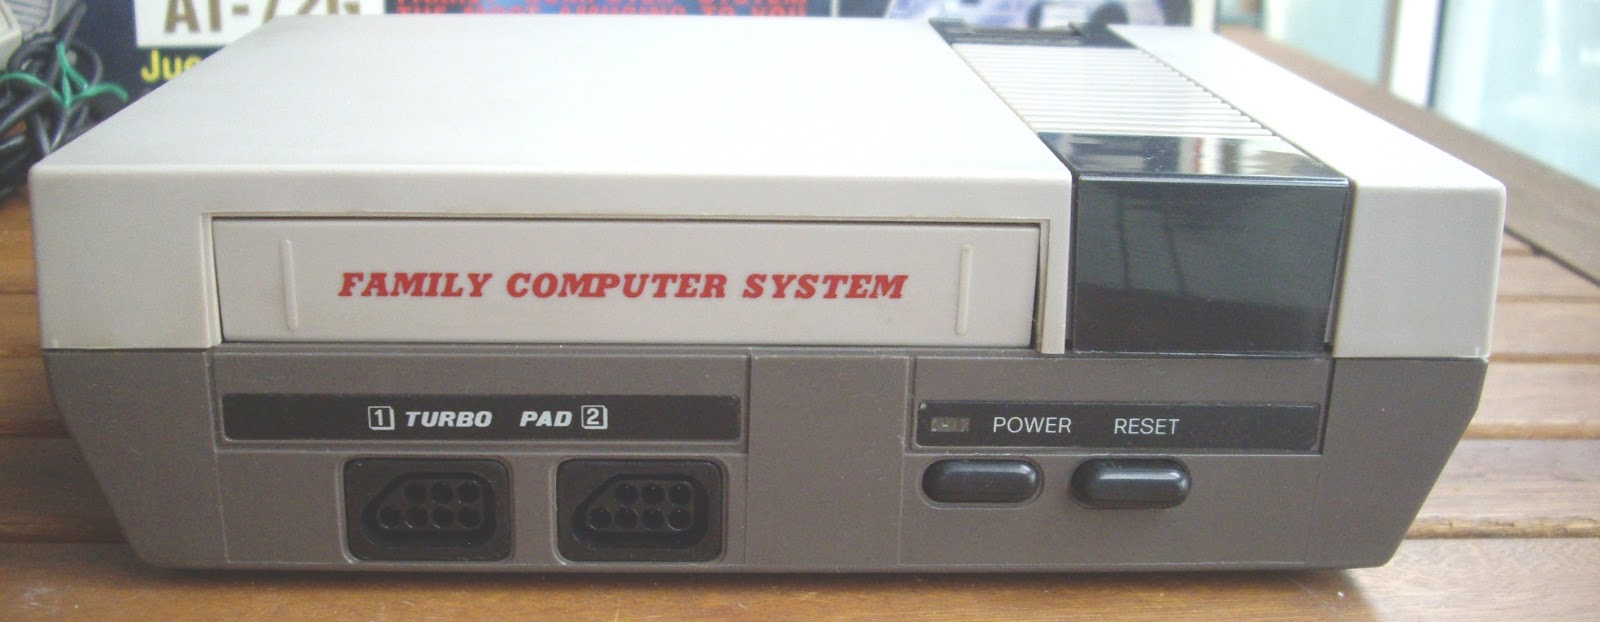 Retro Ordenadores Orty Consola Family Computer System Action Set